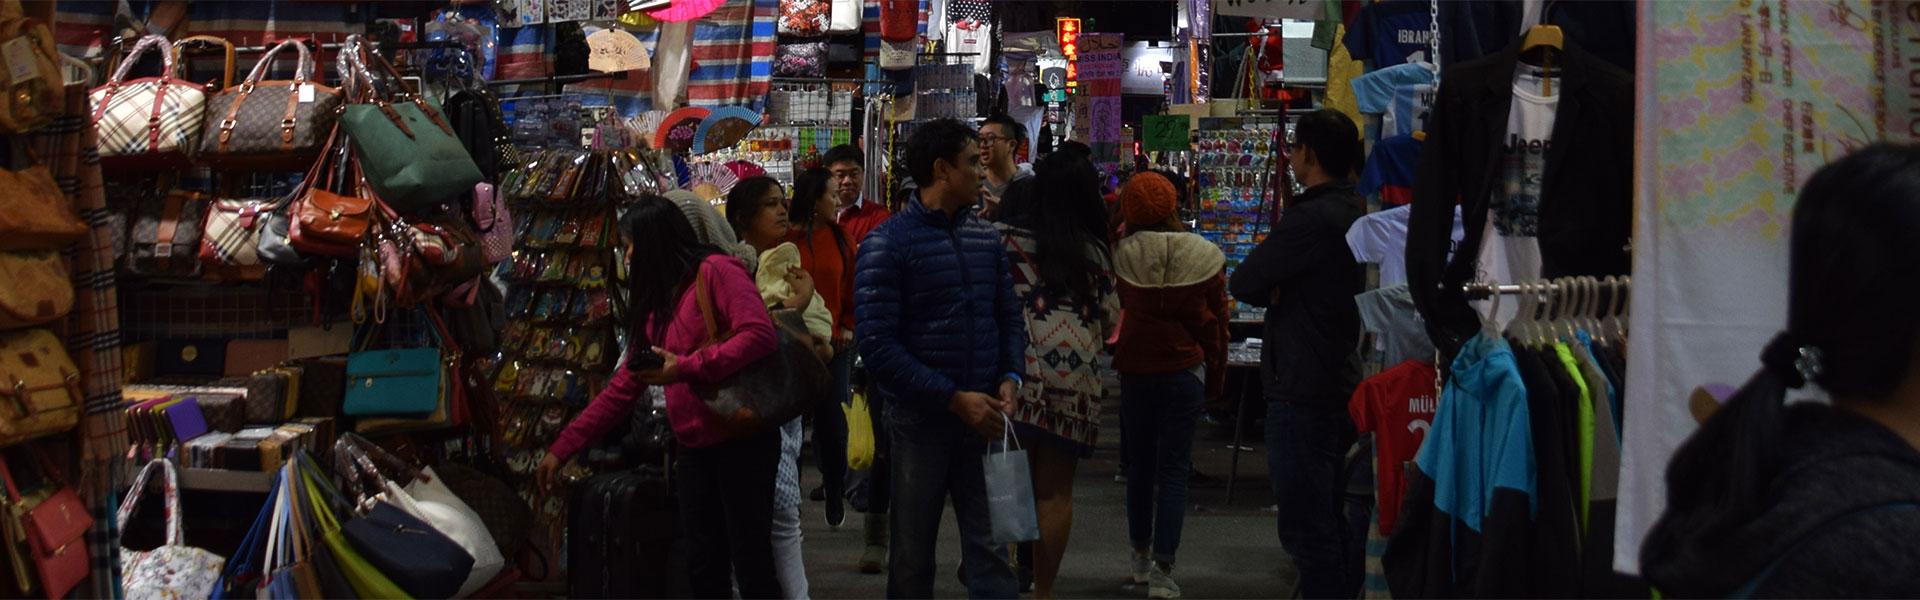 Street market in Lan Kwai Fong Hong Kong